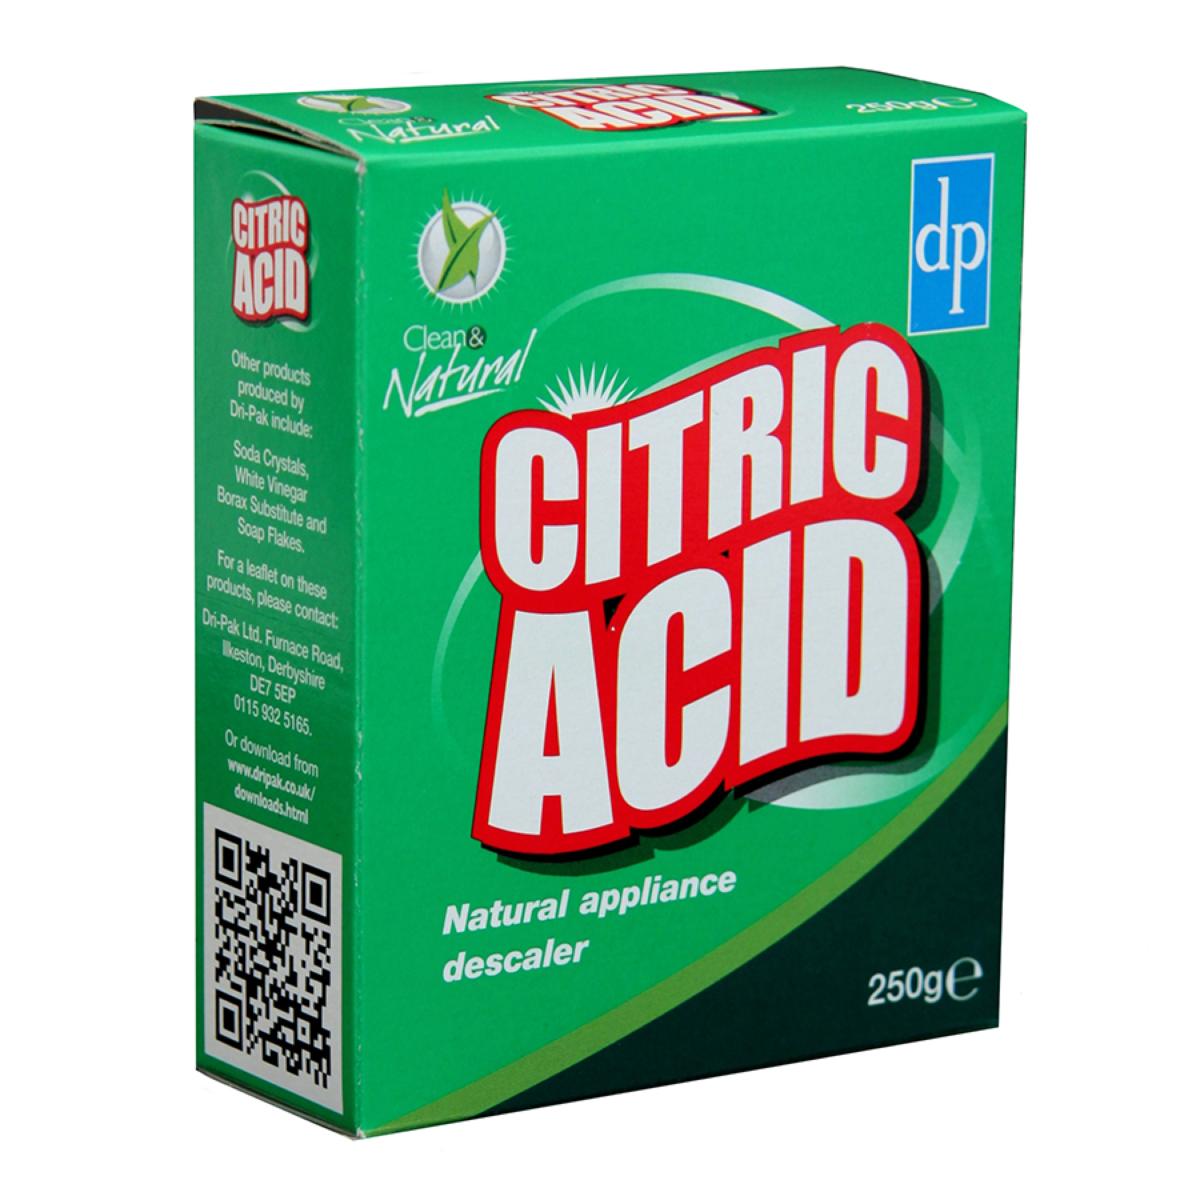 Dri-Pak Citric Acid Powder - 250g